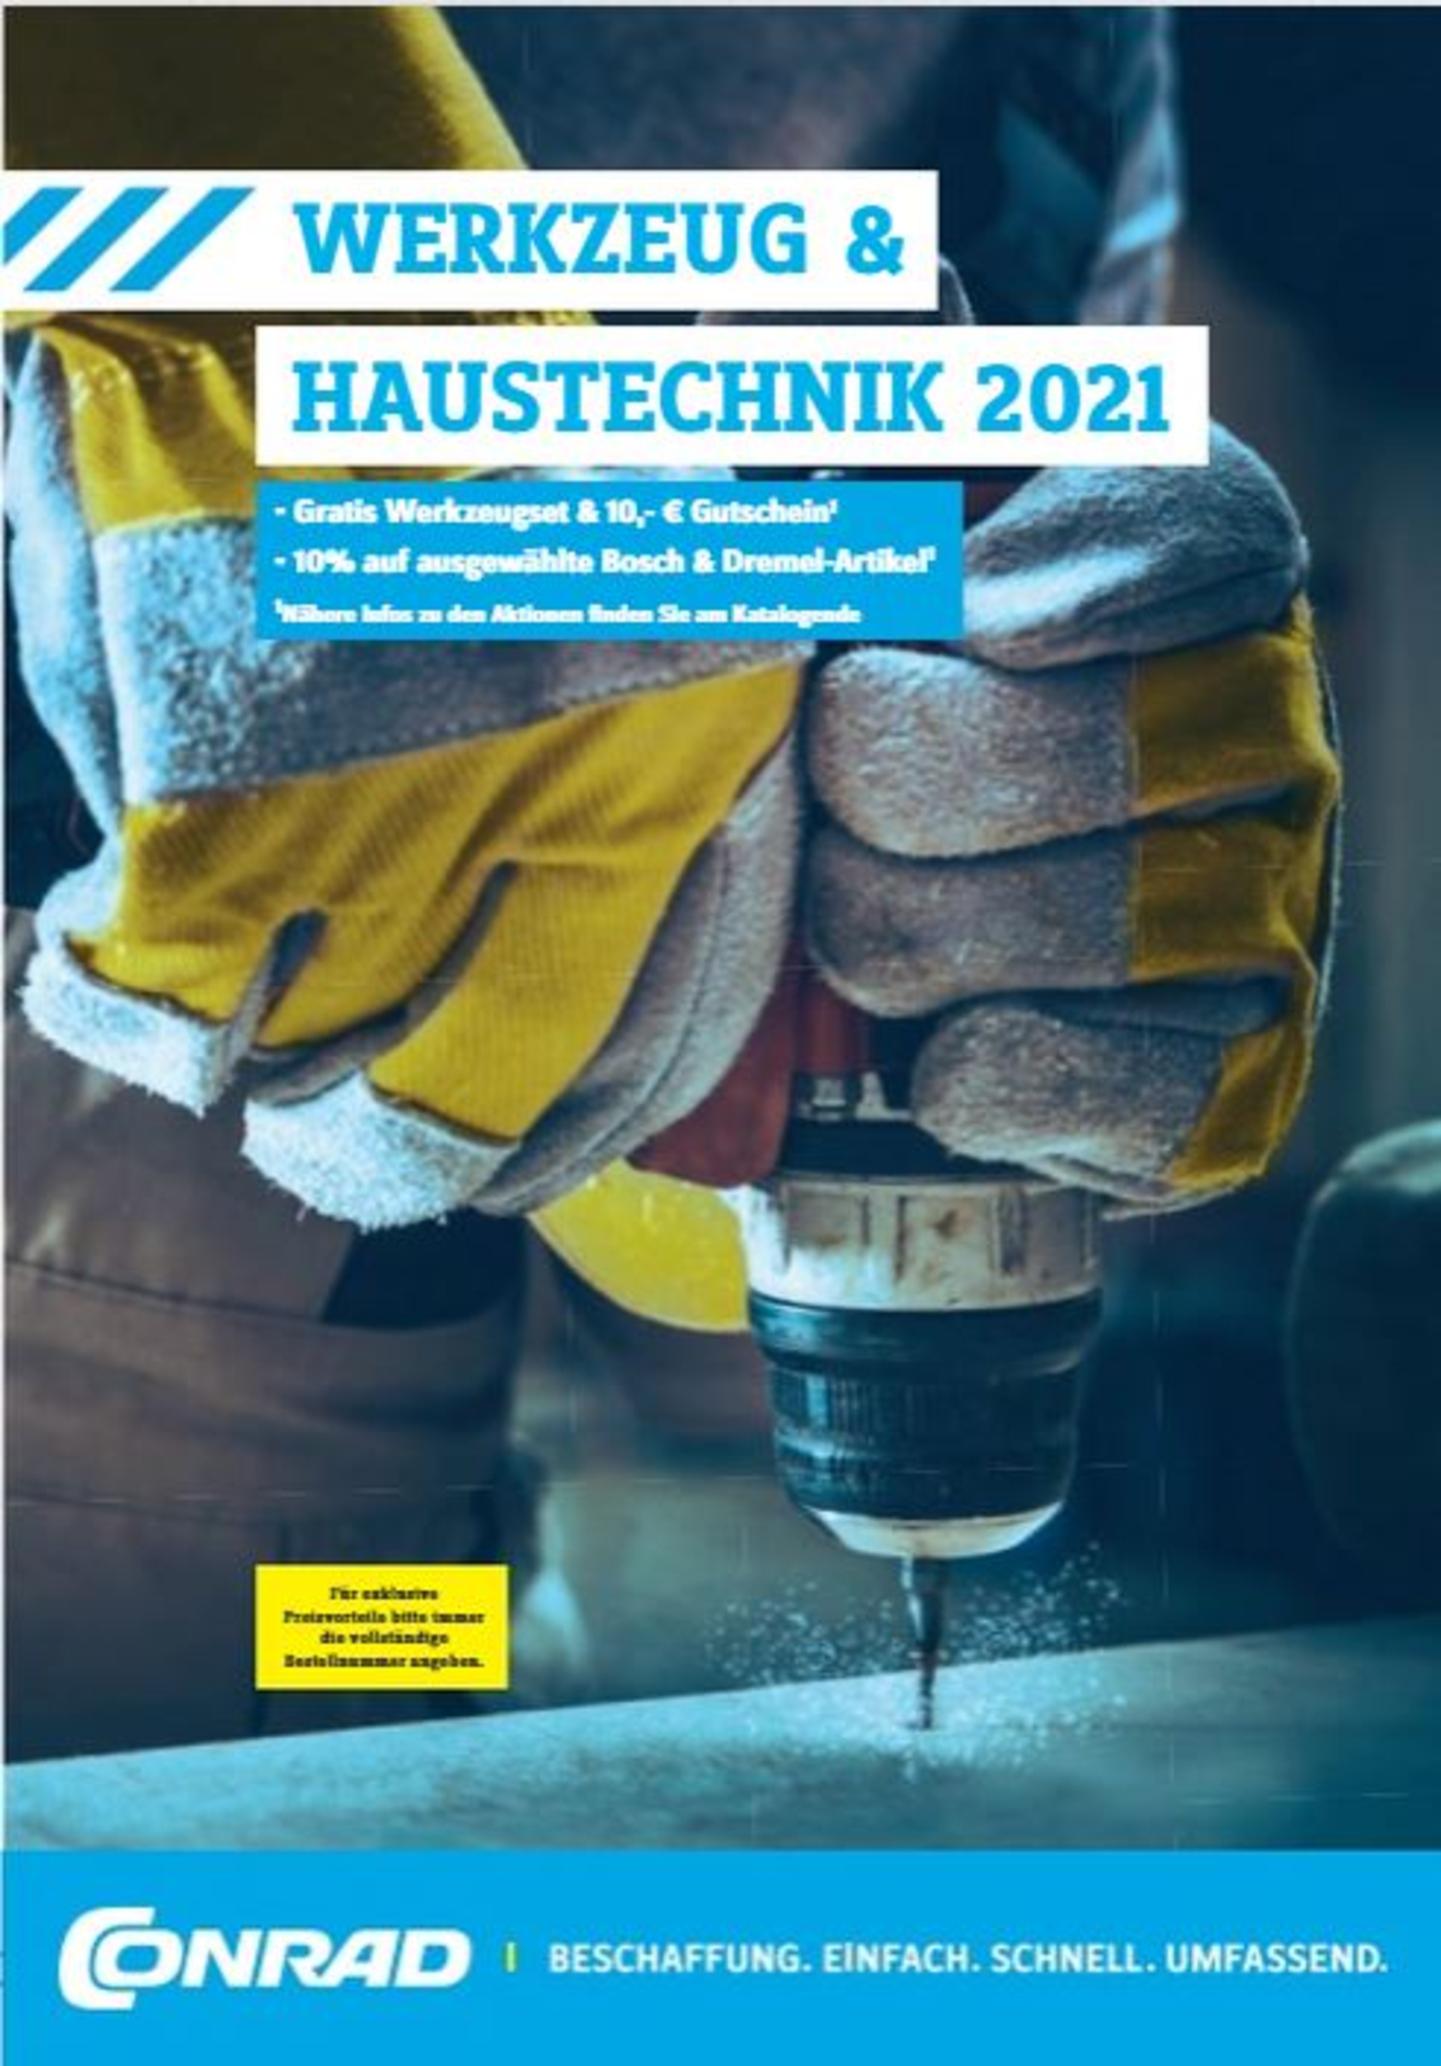 Werkzeug & Haustechnik